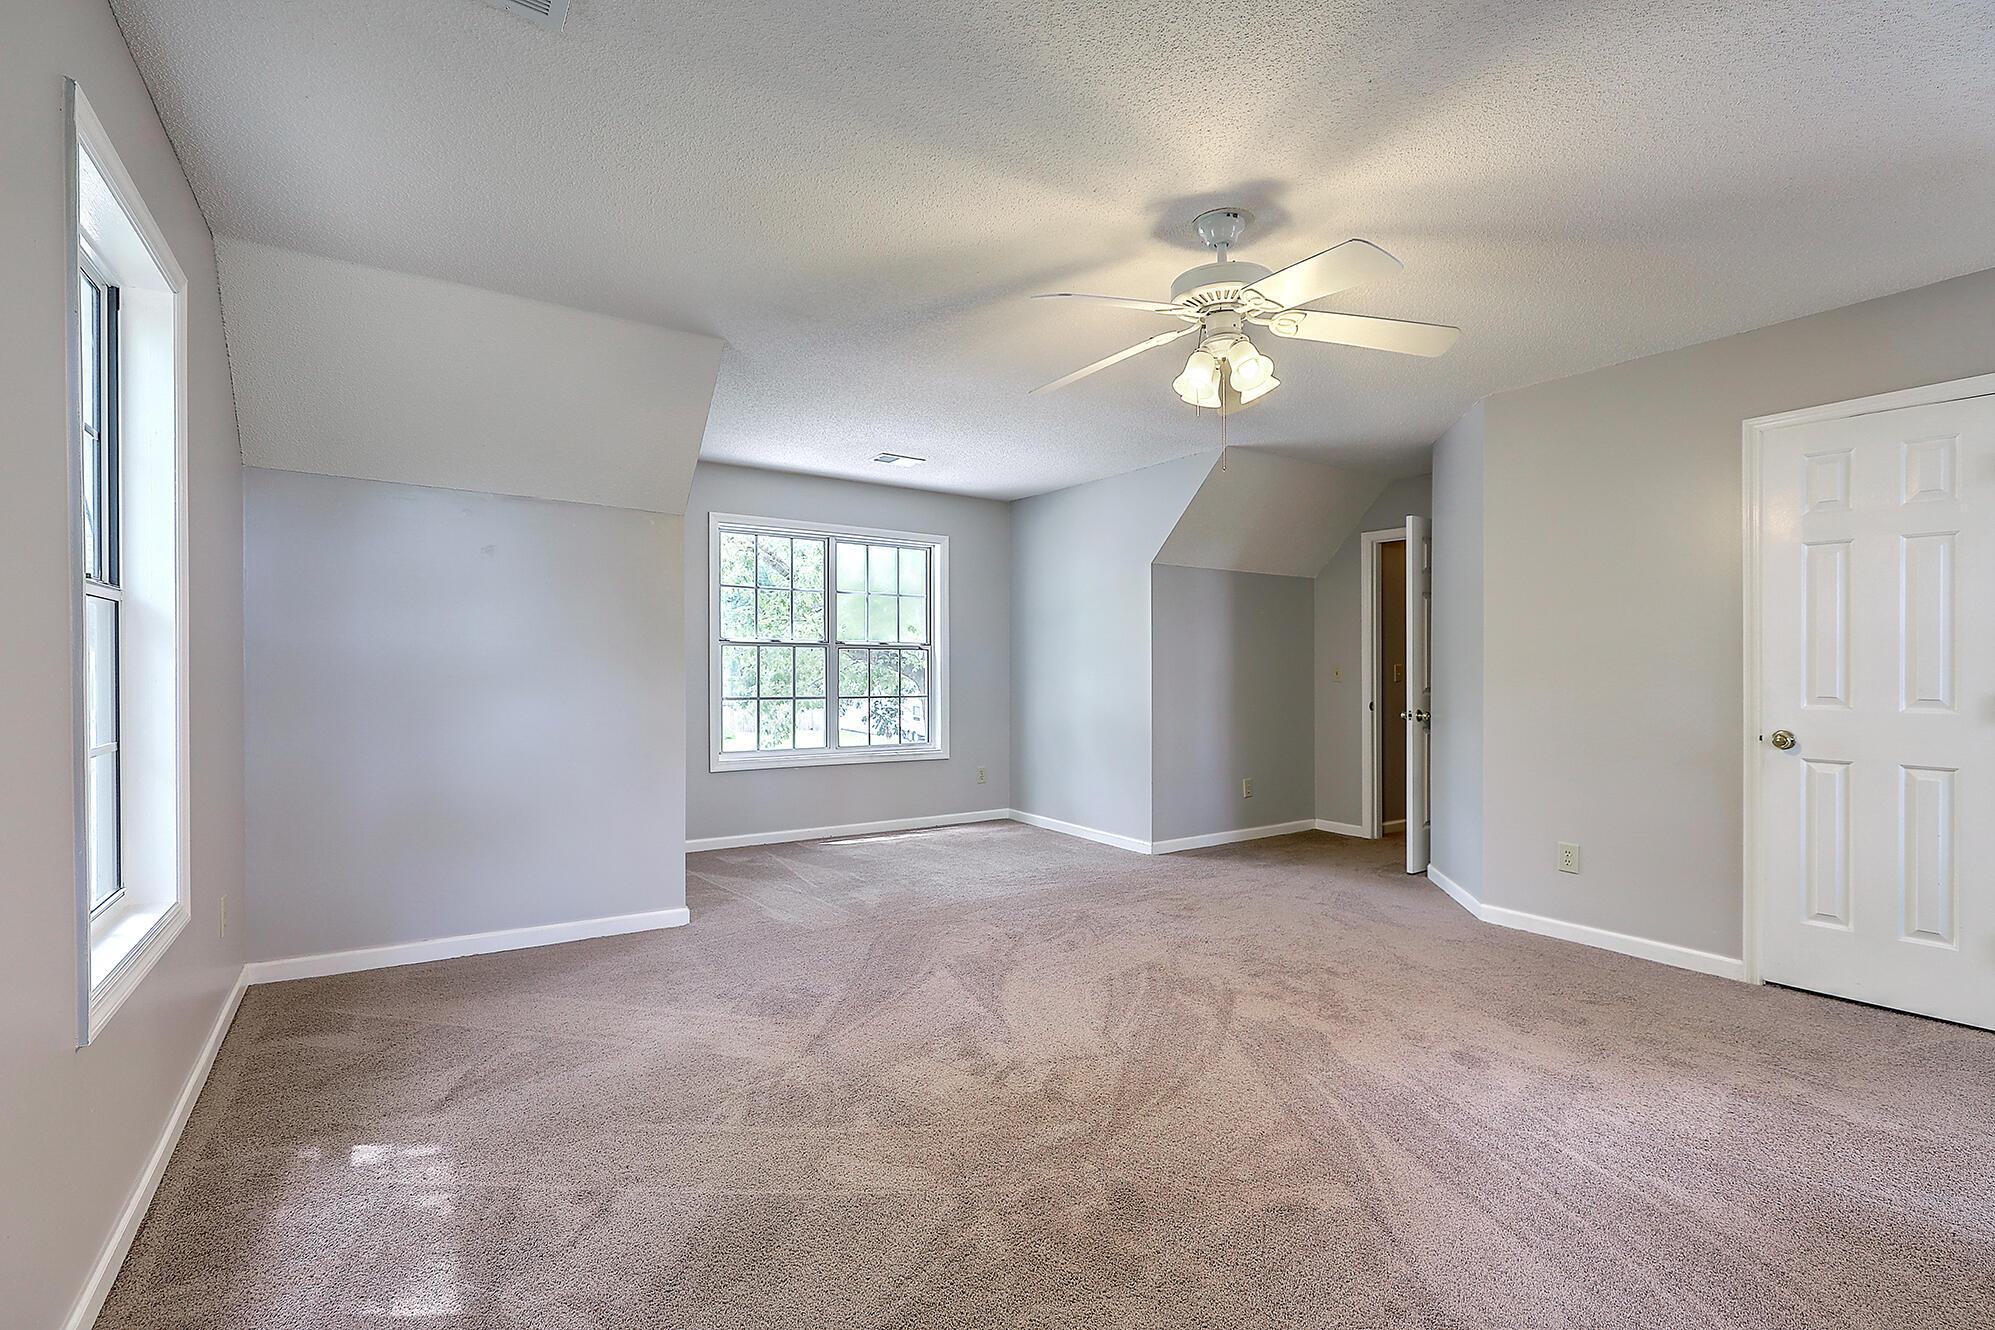 Appian Landing Homes For Sale - 8262 Longridge, North Charleston, SC - 3